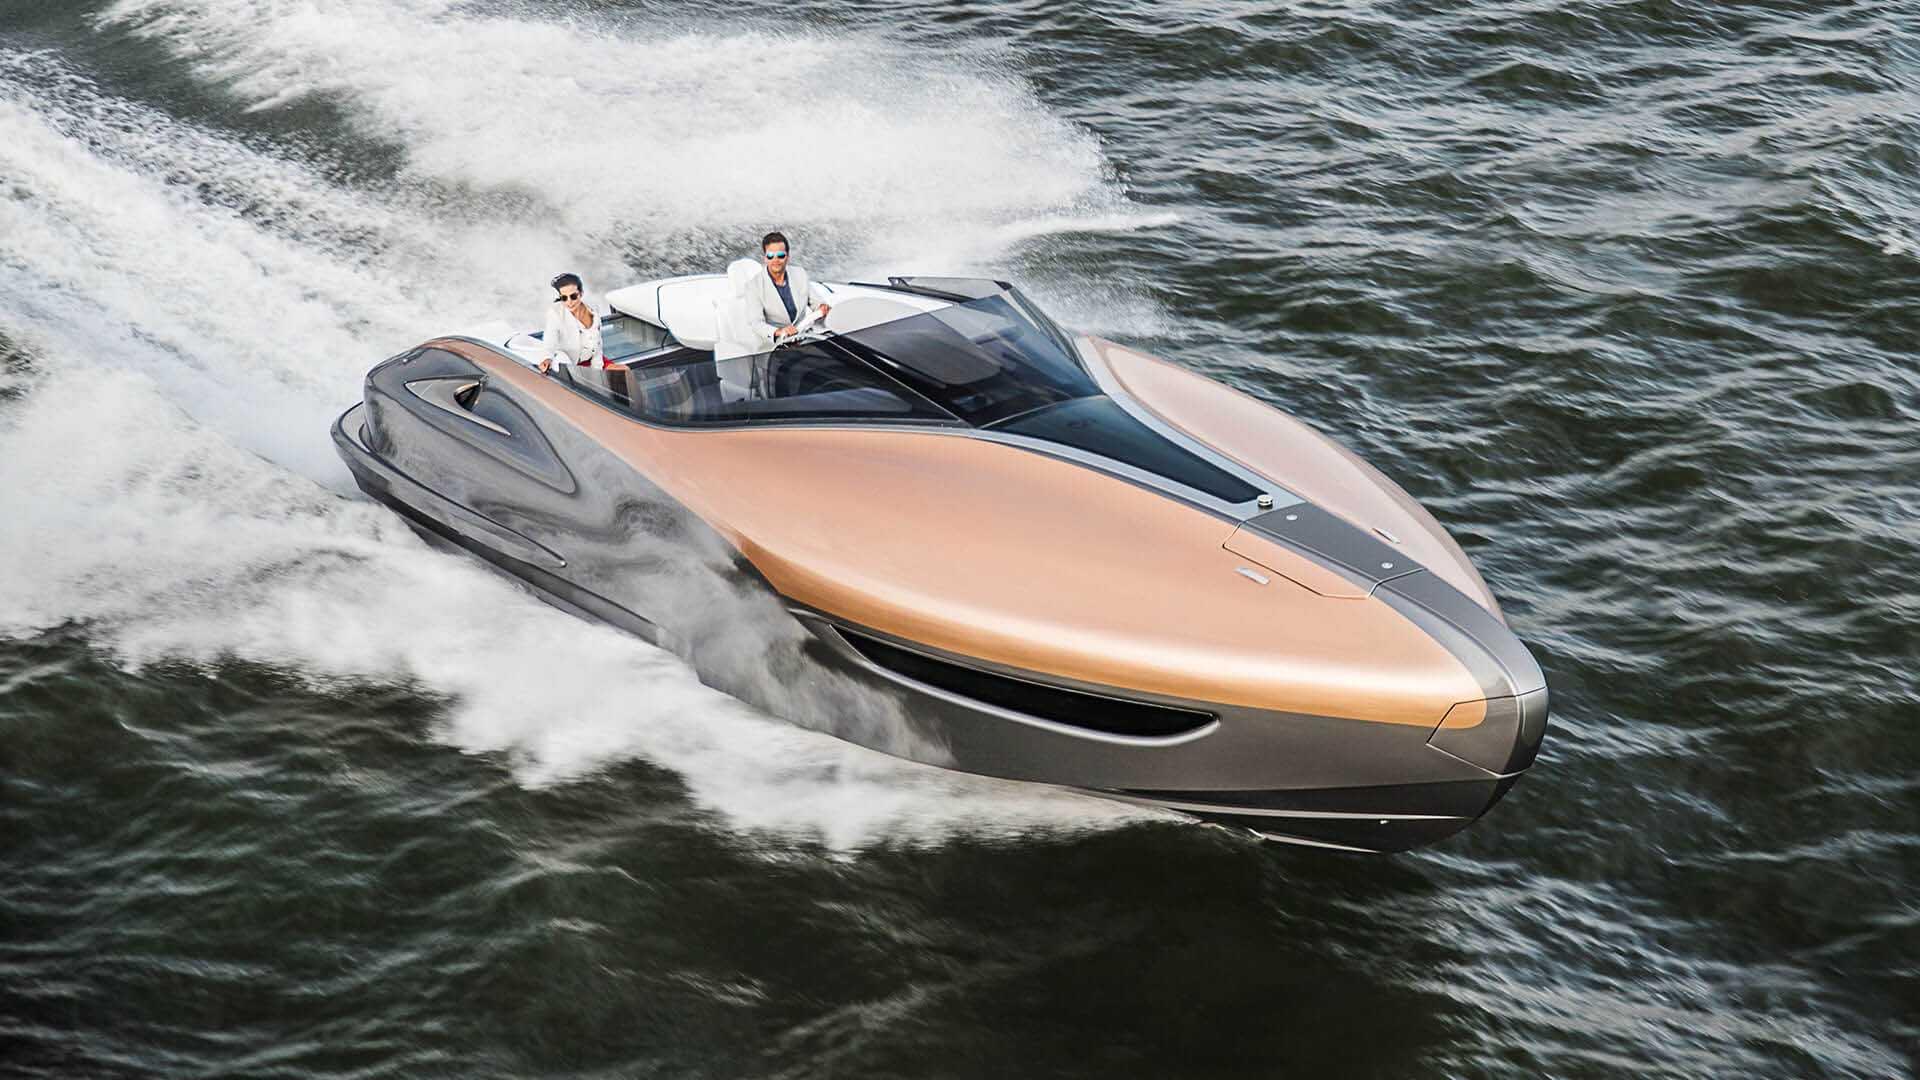 2017 lexus yacht nextSteps01